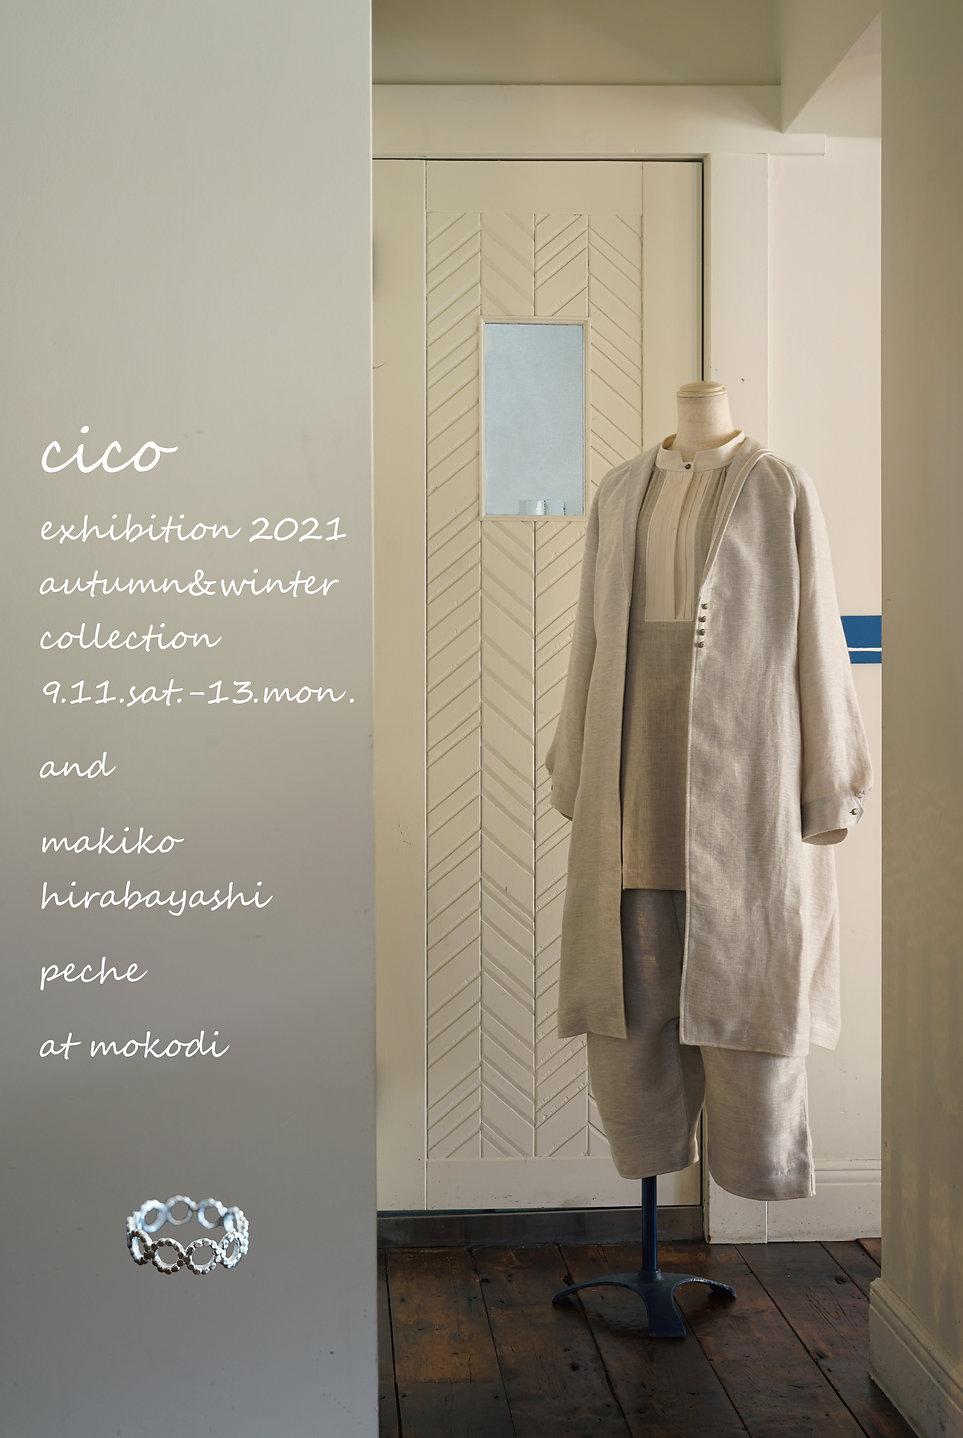 cico2021dm.web.jpg